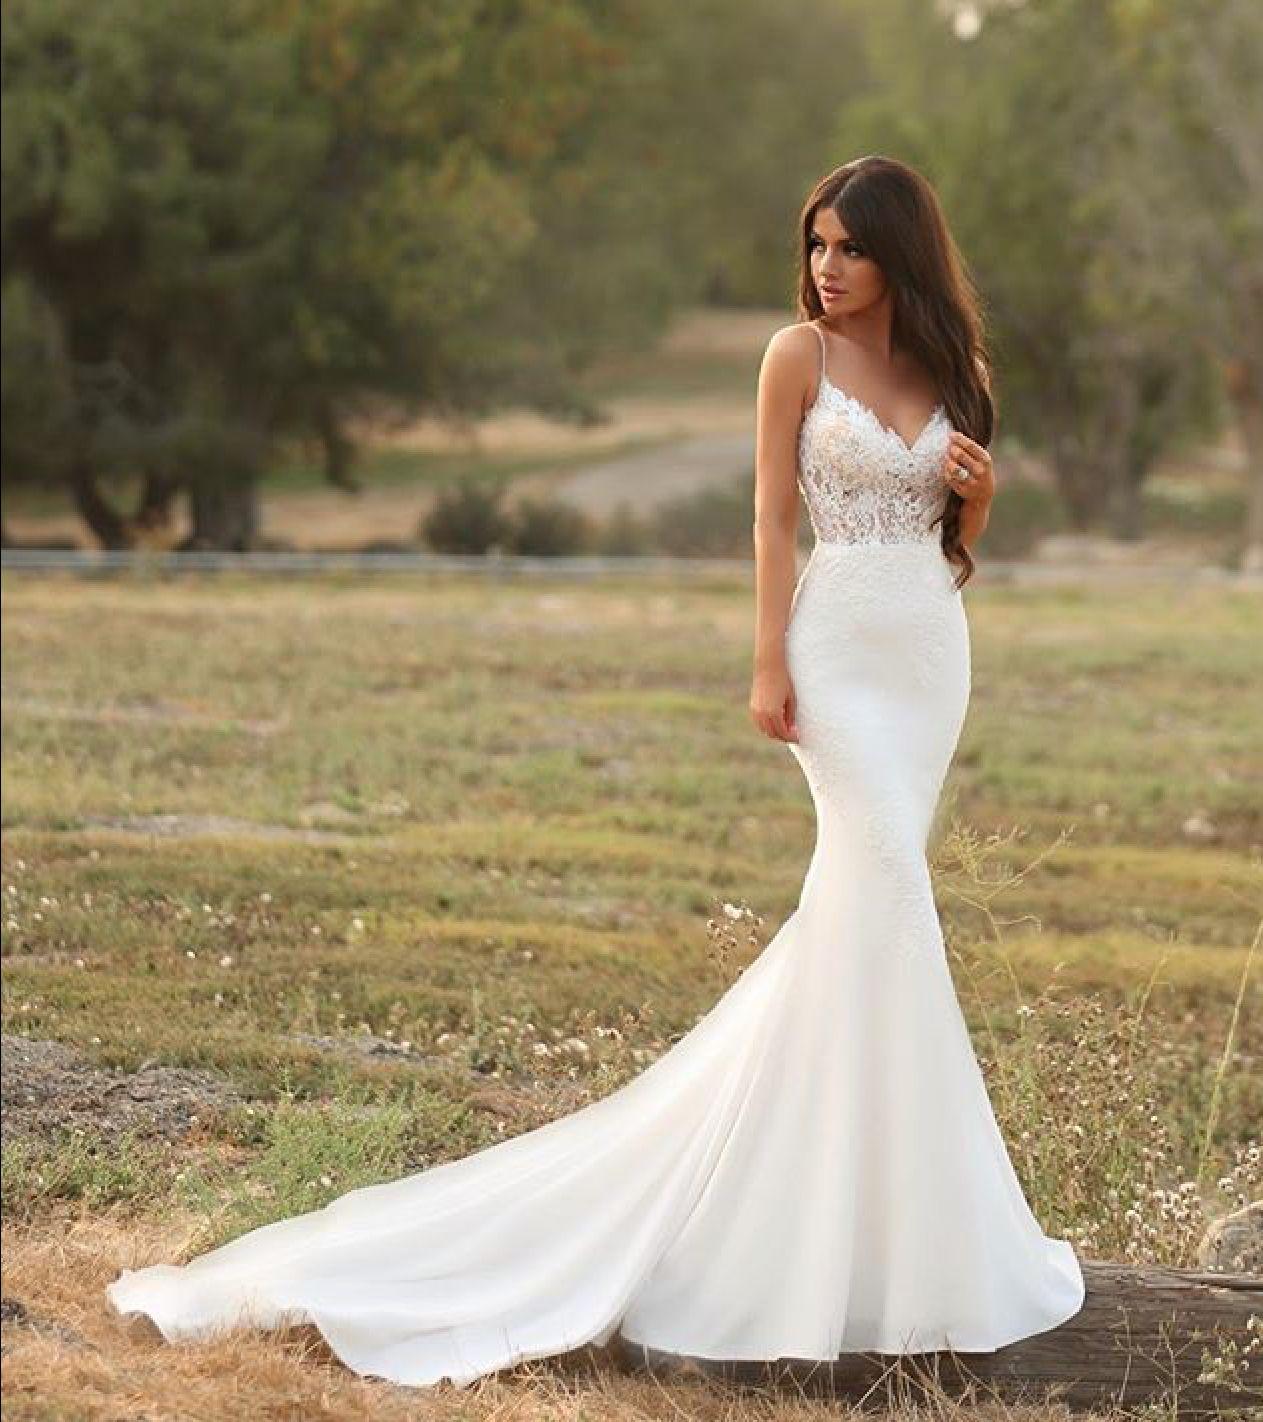 Vow Renewal Satin Mermaid Wedding Dress Bridal Dresses Lace Modest Bridal Gowns [ 1422 x 1263 Pixel ]